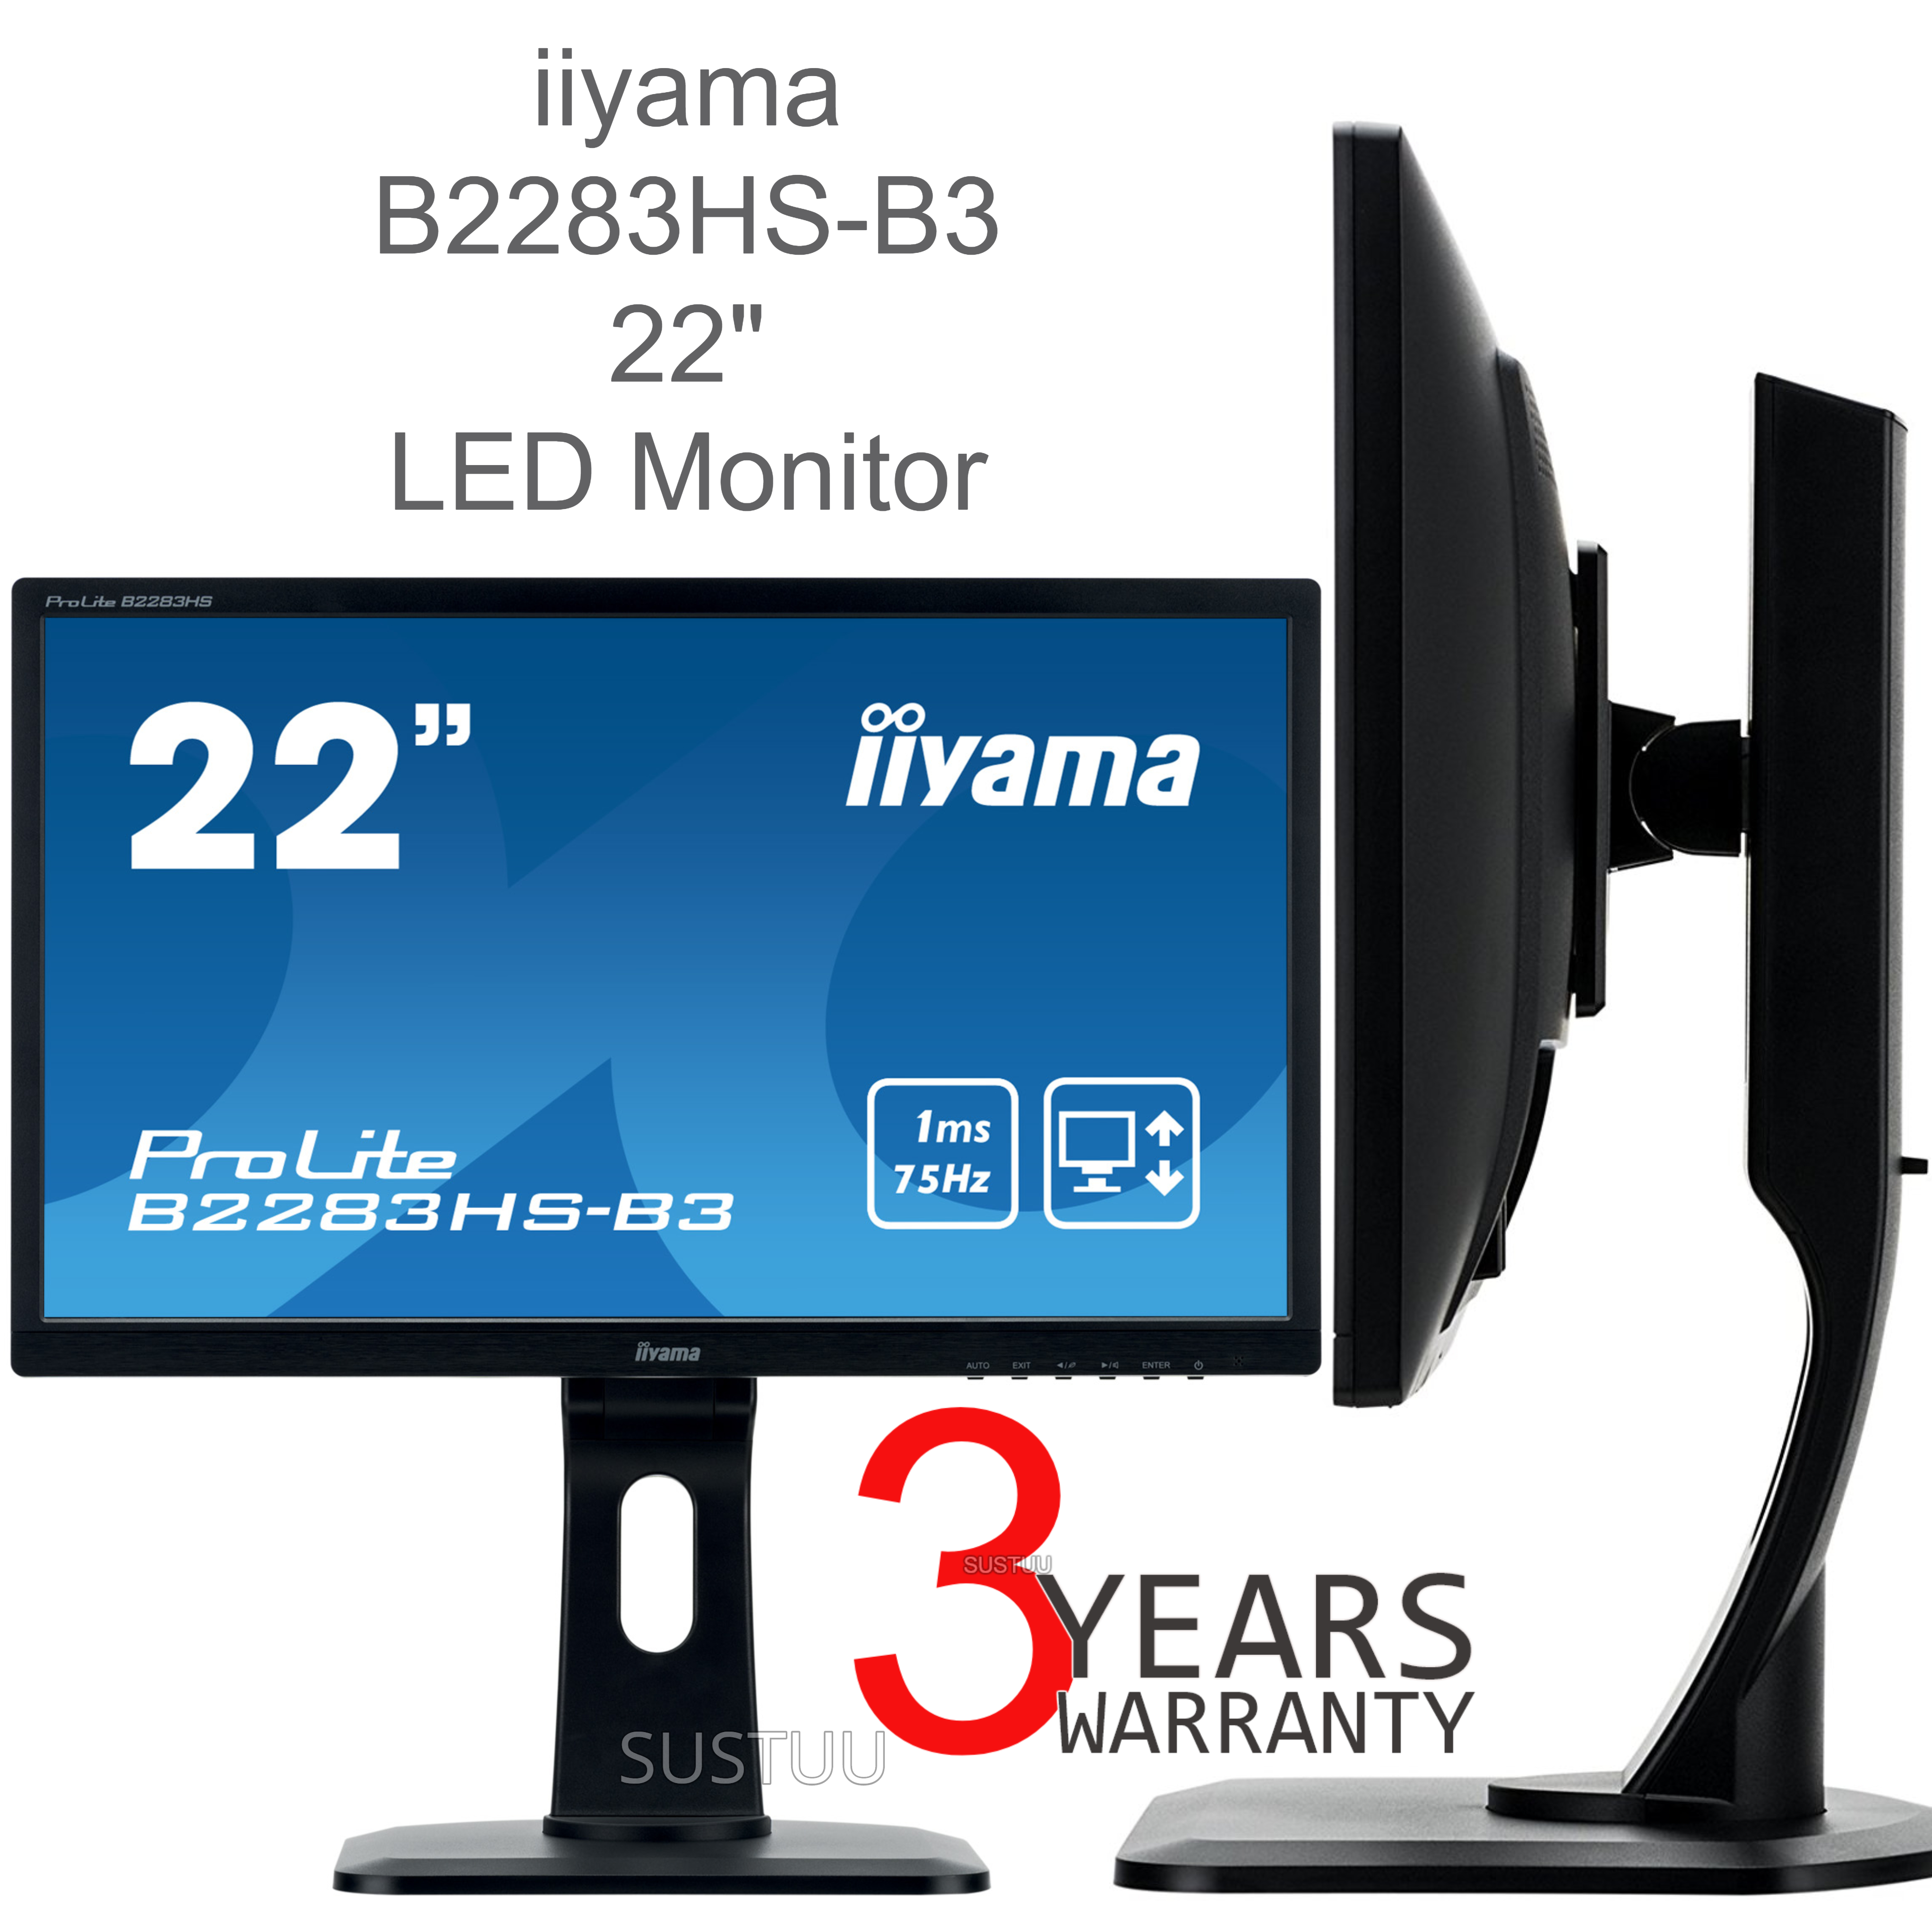 Iiyama ProLite LED Monitor | 22'' Full HD Display | Height Adjustable | For Mac Computers